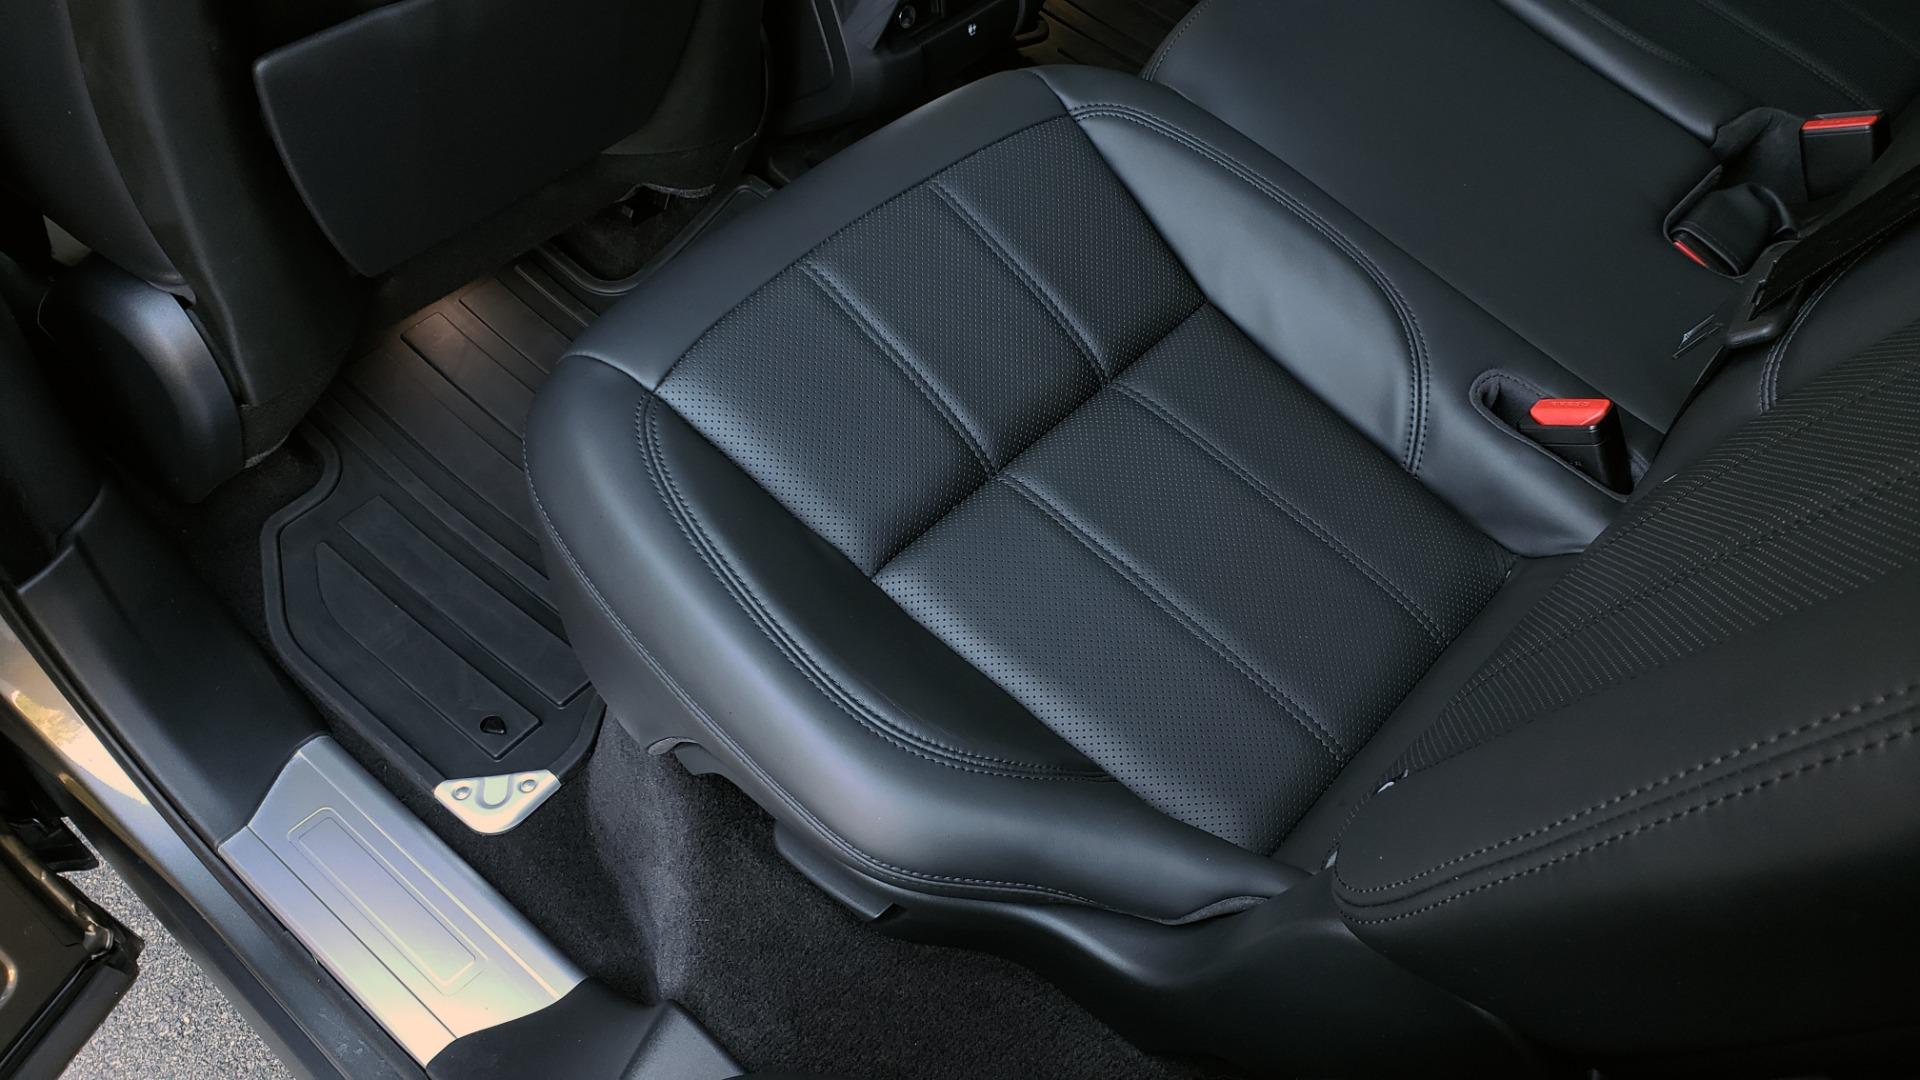 Used 2018 Land Rover RANGE ROVER SPORT DYNAMIC SC V8 / CLIMATE CMFRT / VISION ASST / MERIDIAN for sale Sold at Formula Imports in Charlotte NC 28227 72